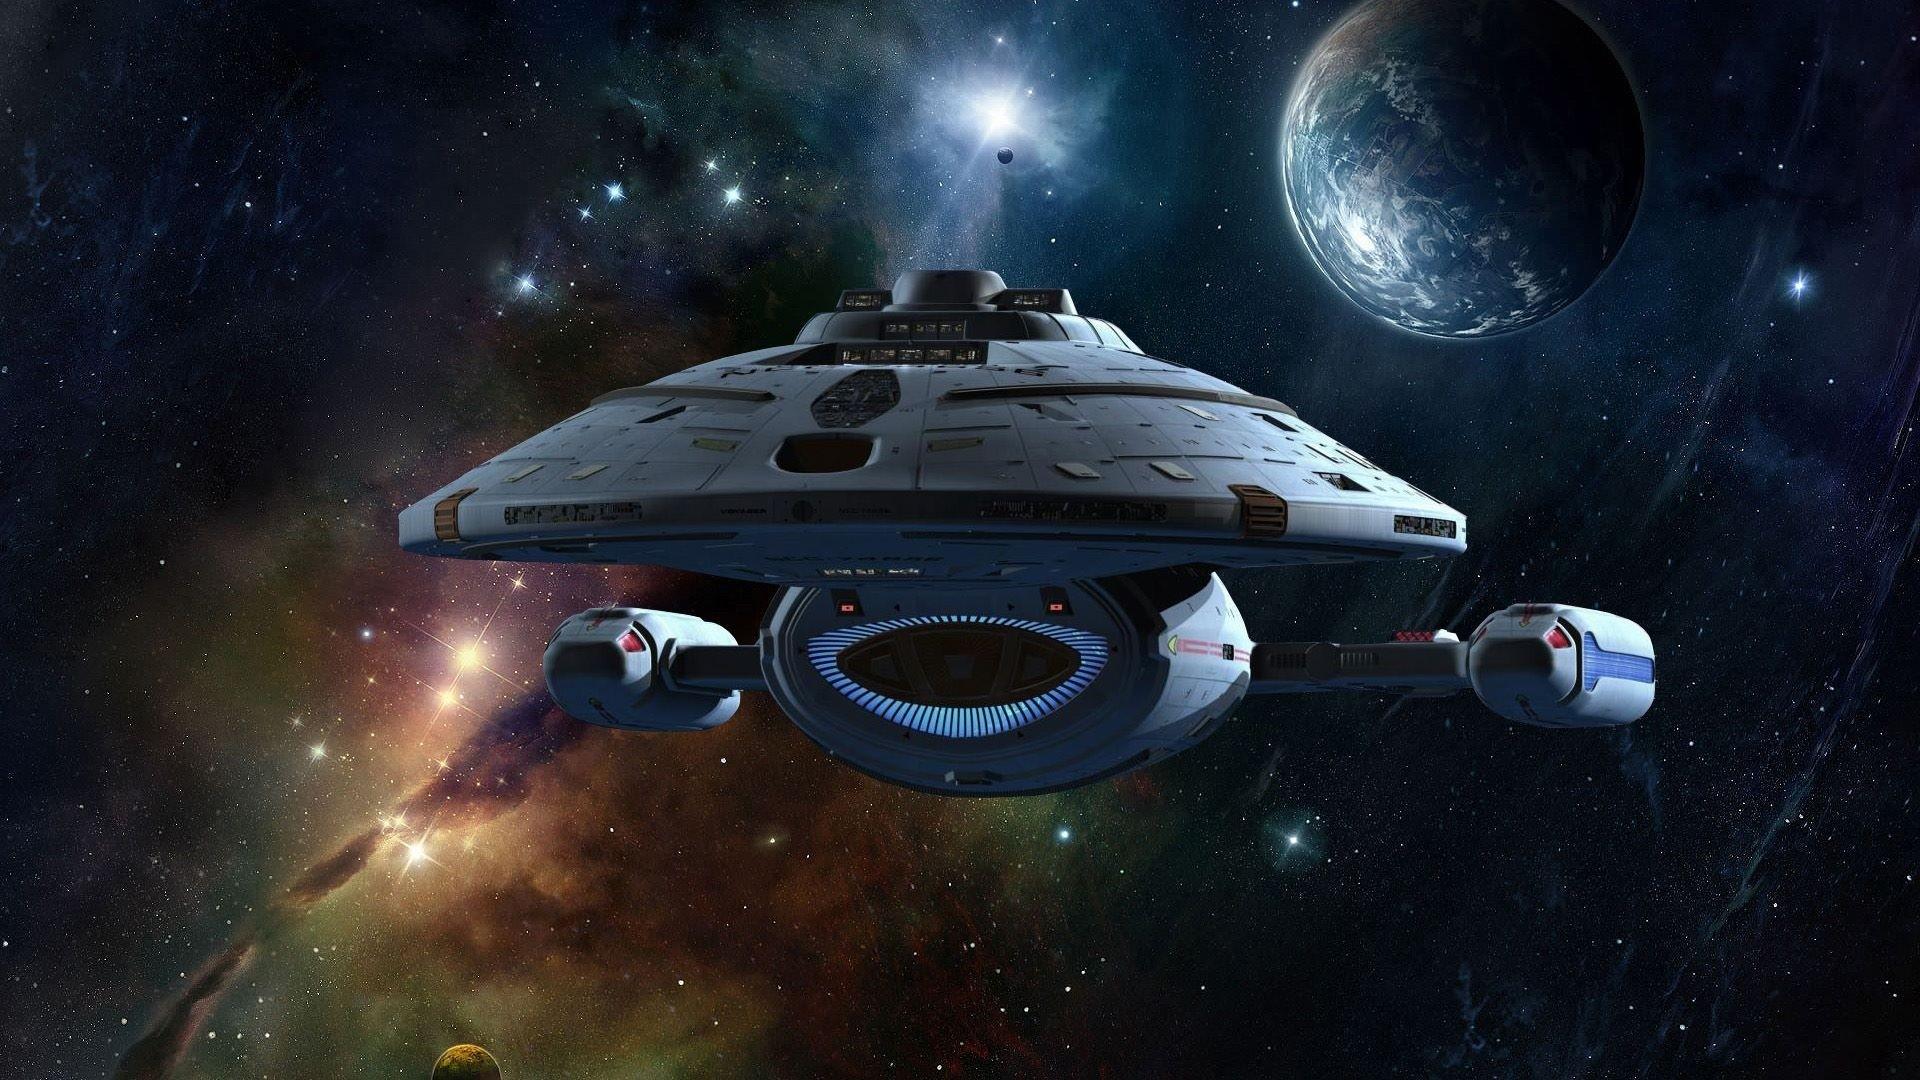 Star Trek High Quality